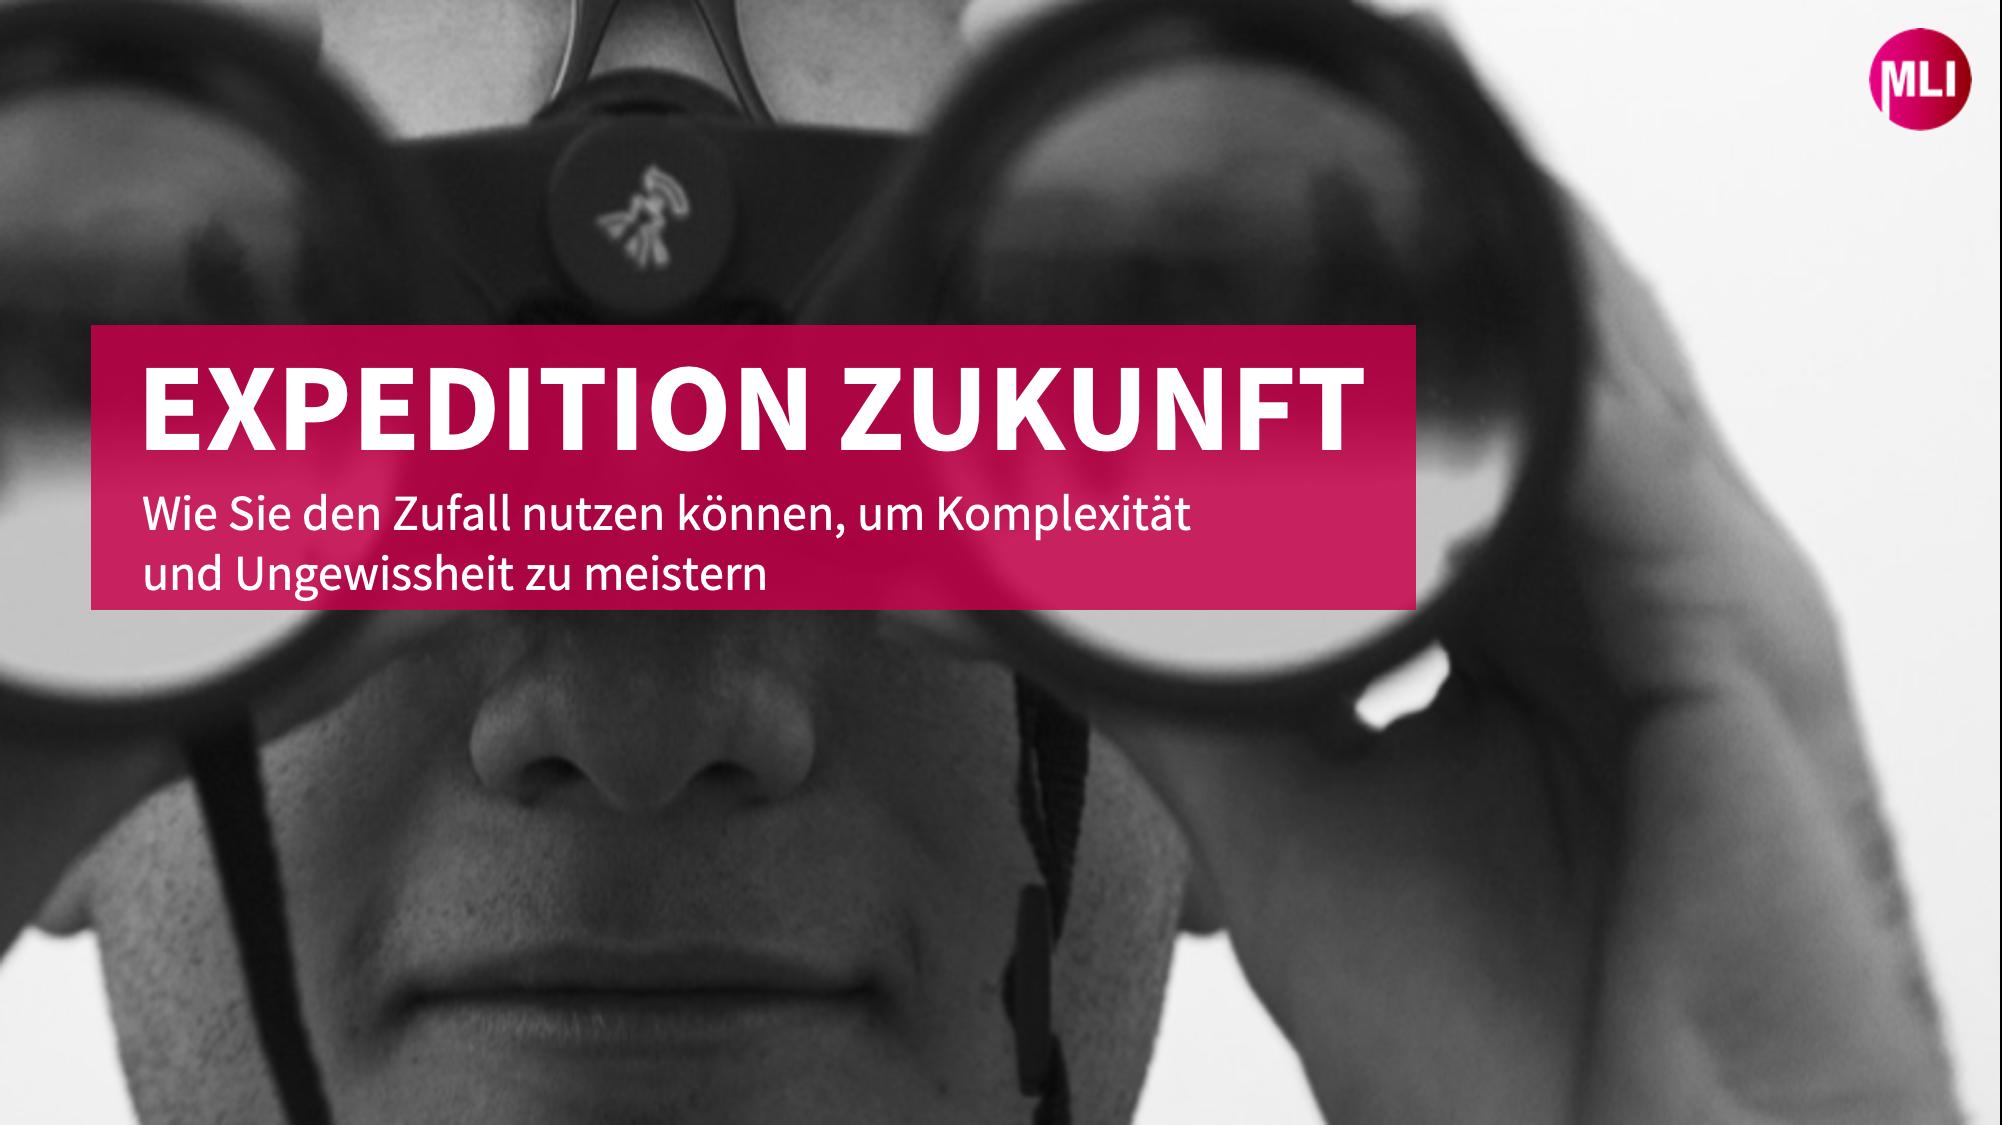 Expedition Zukunft